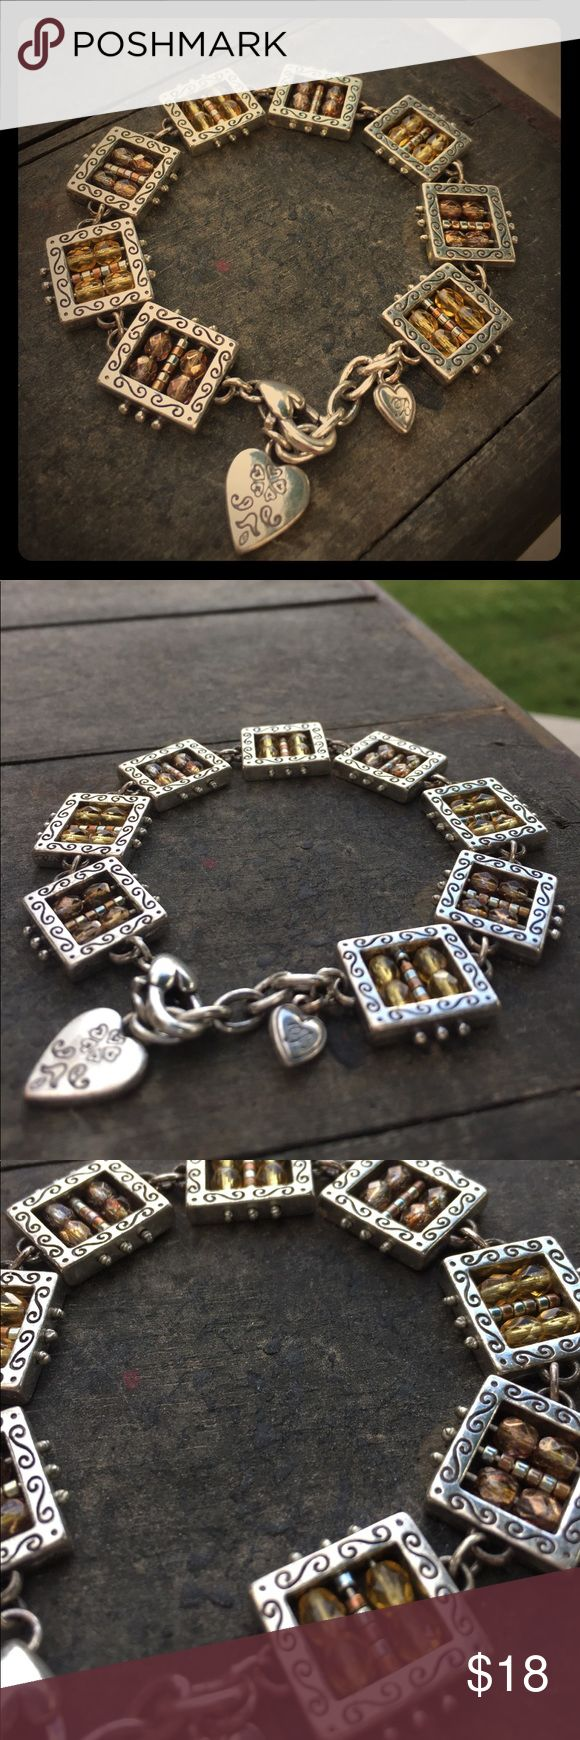 Brighton Bracelet Silver Brighton bracelet with adjustable heart ❤️ clasp. Bracelet is like new. No scratches. Brighton Jewelry Bracelets